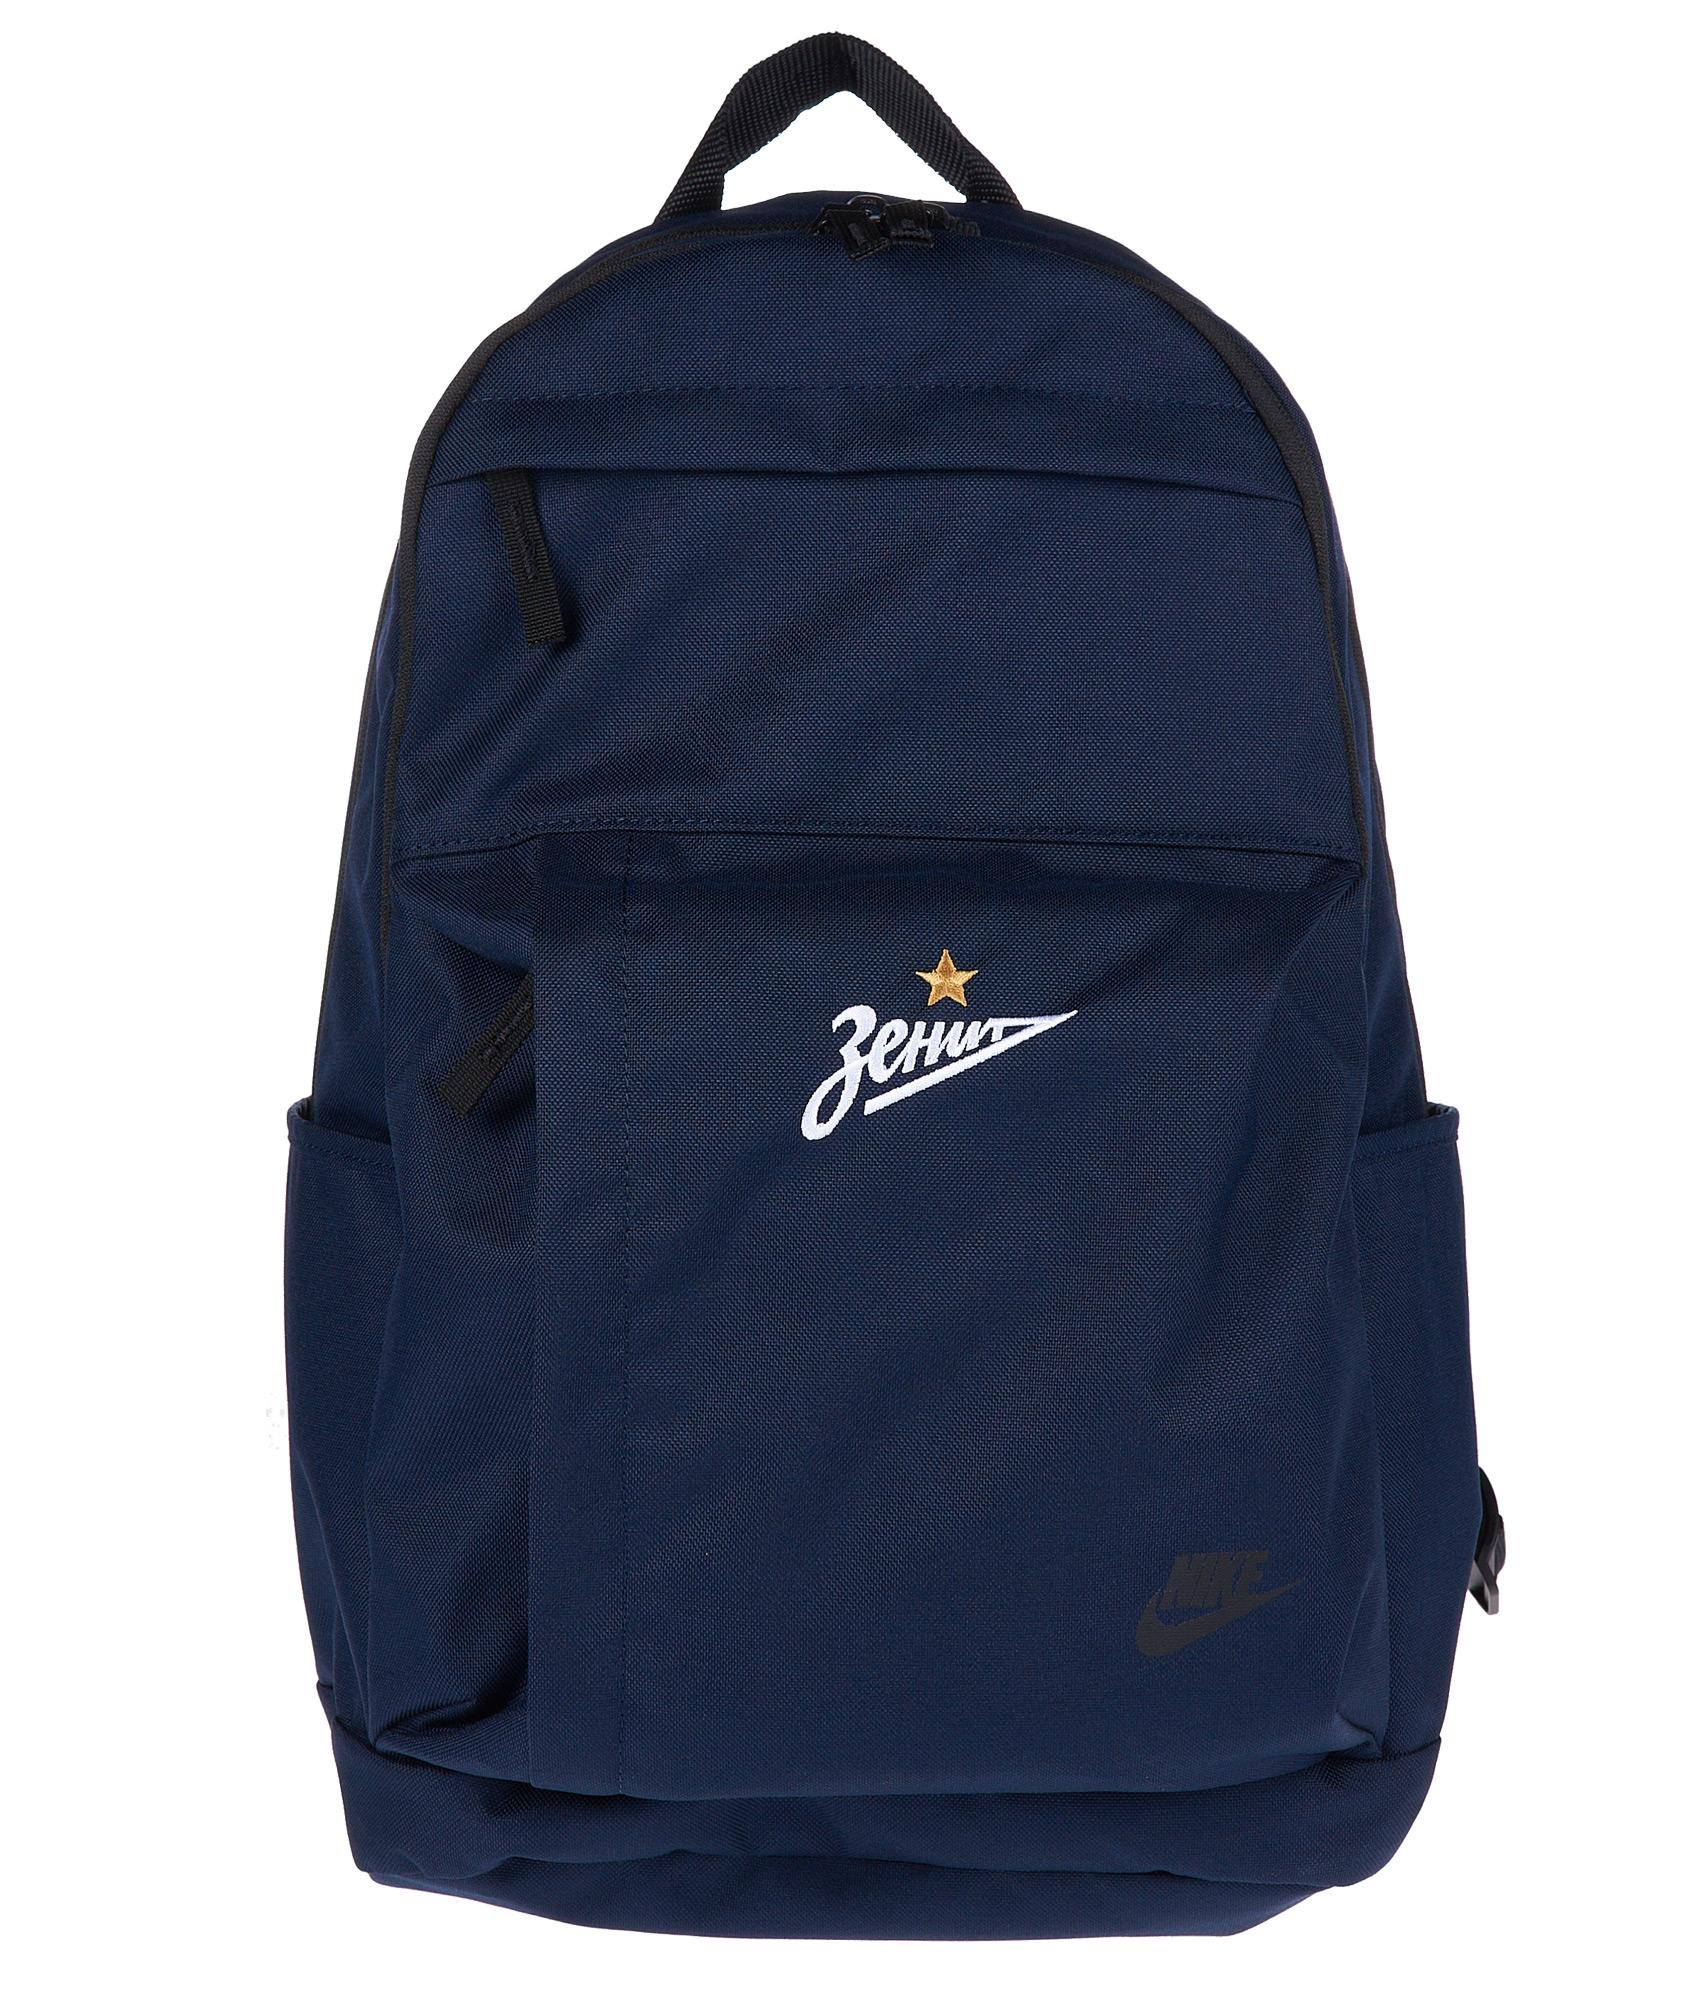 Рюкзак Nike Nike Цвет-Синий рюкзак nike nike ni464bkeud34